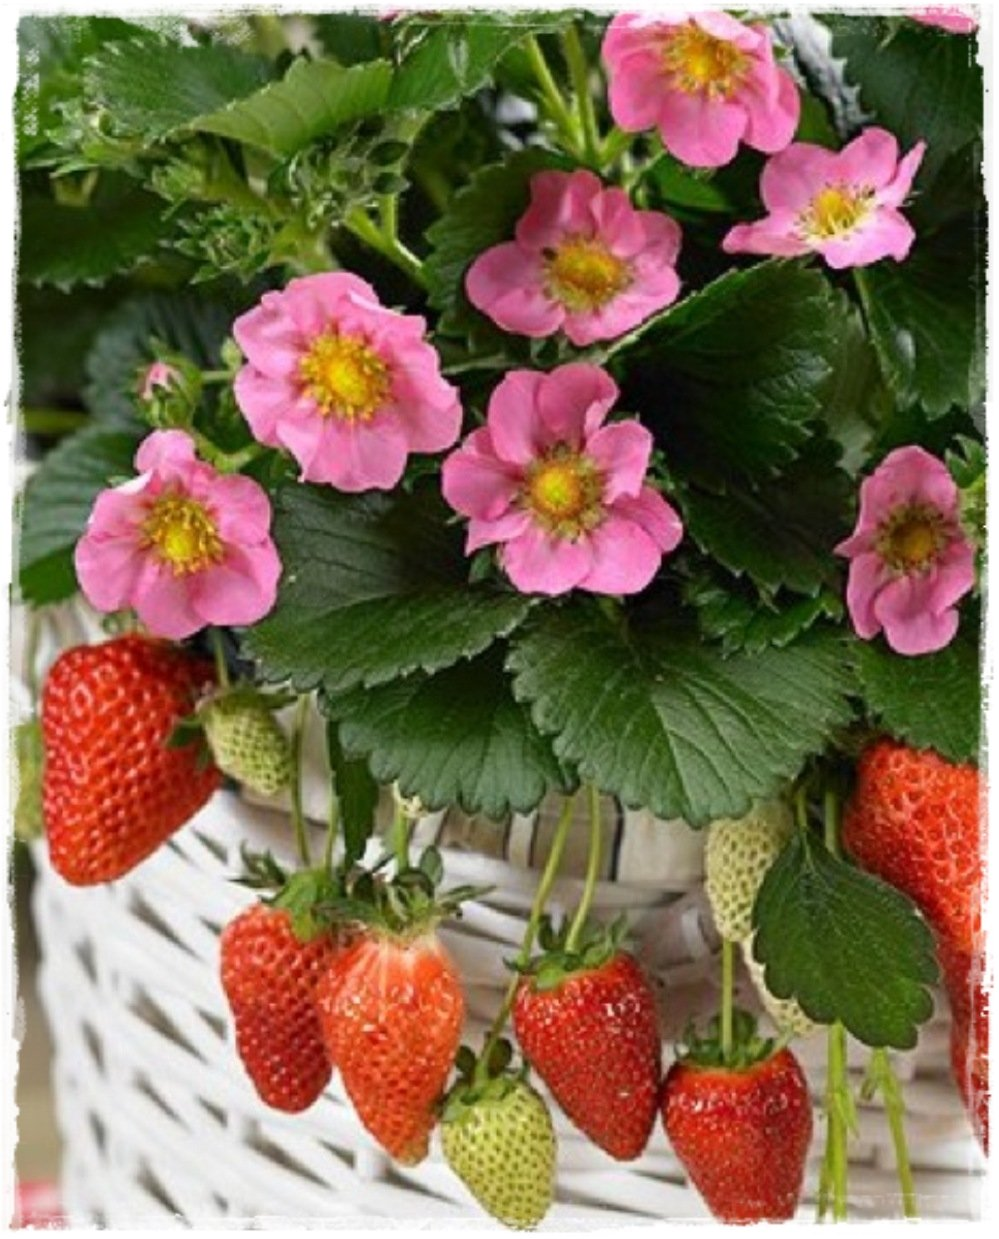 Fragola rifiorente 39 tutu 39 39 fiore rosa vendita piante for Pianta di fragole